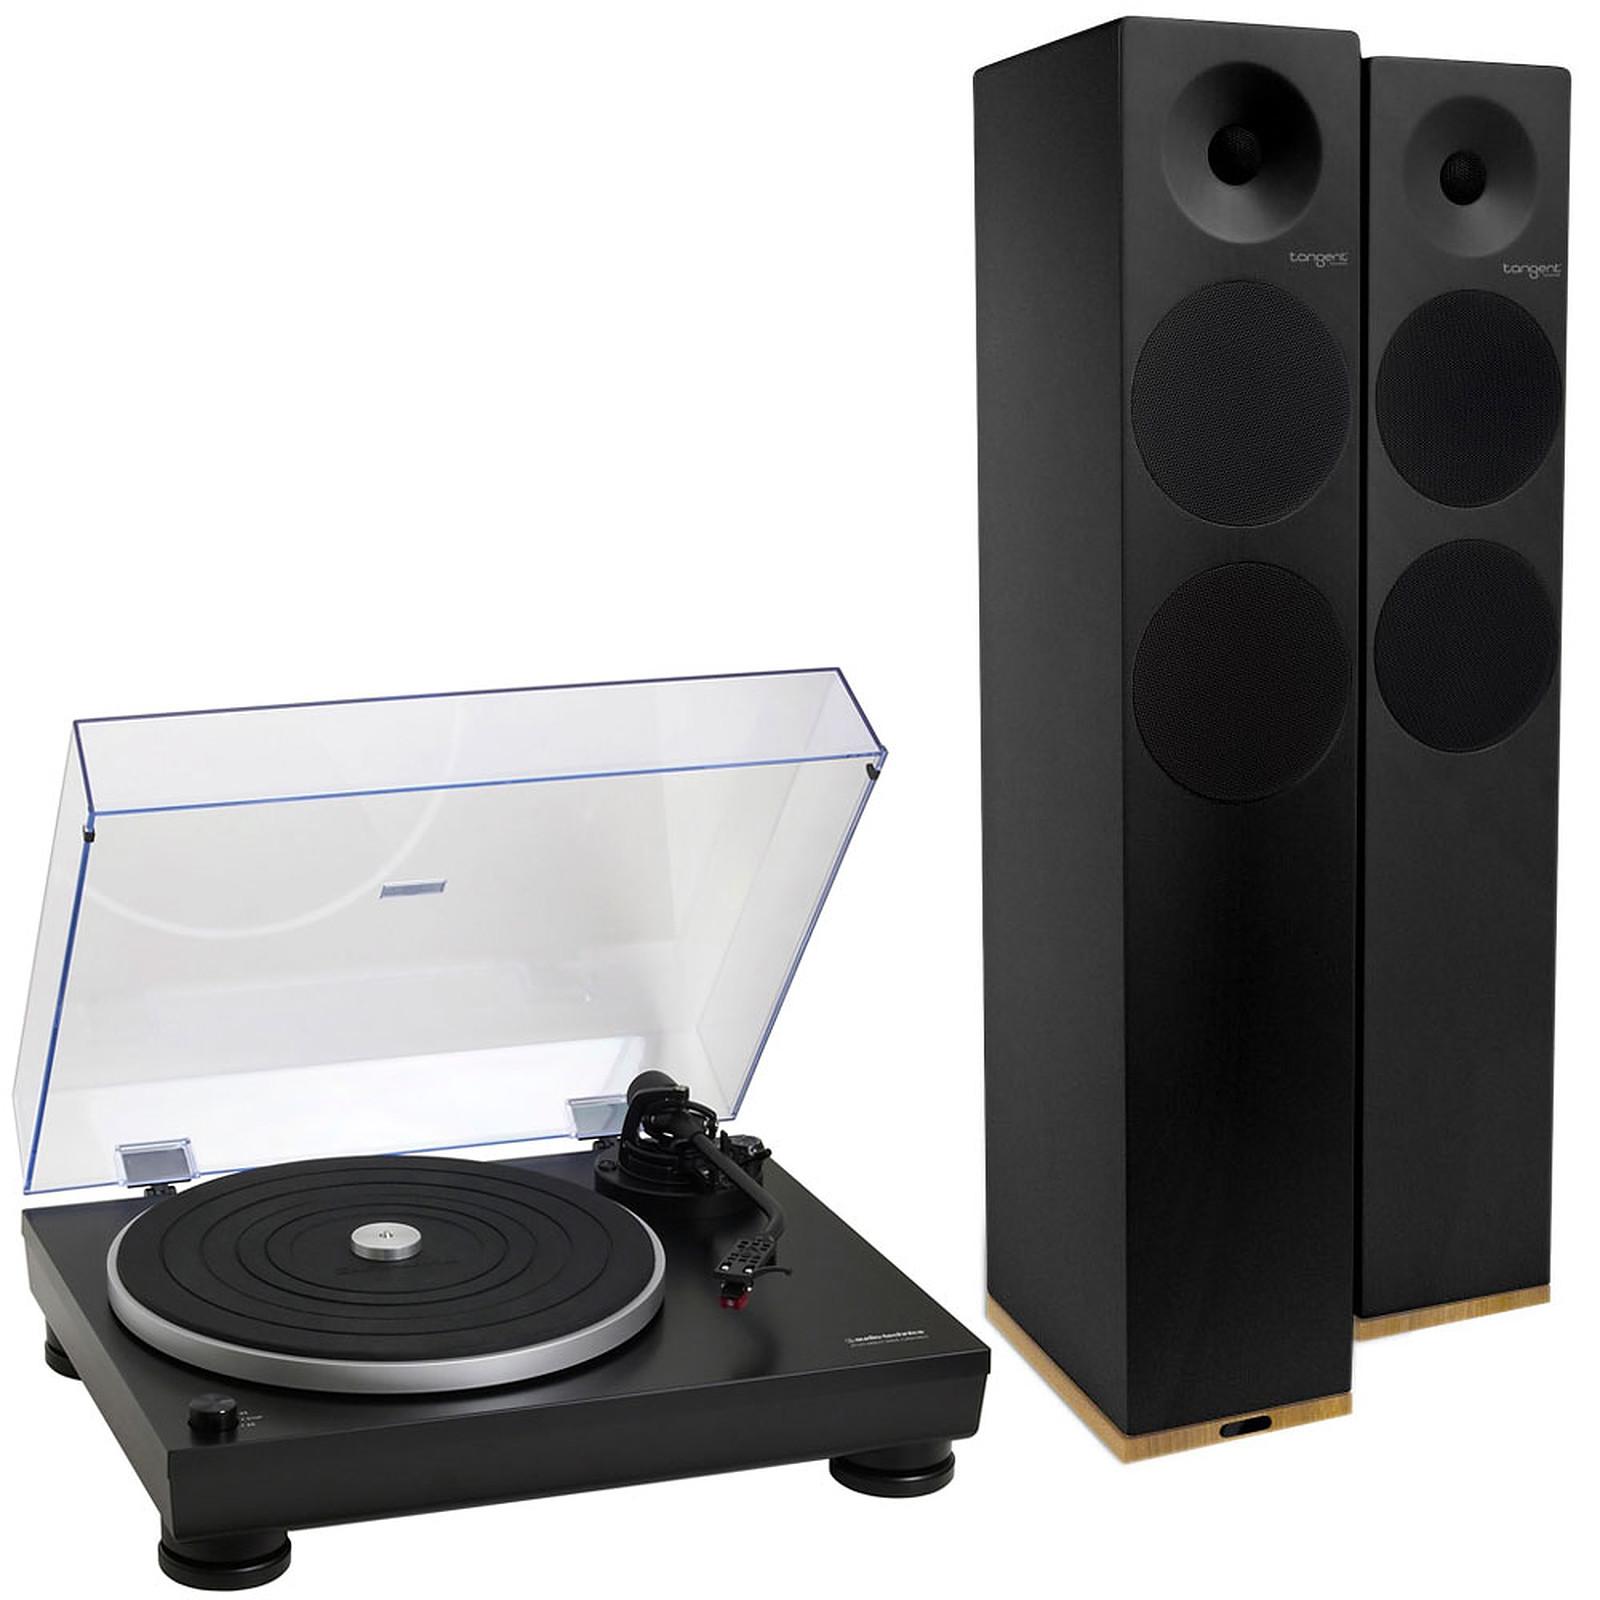 Audio-Technica AT-LP5 Noir + Tangent Spectrum X6 BT Noir